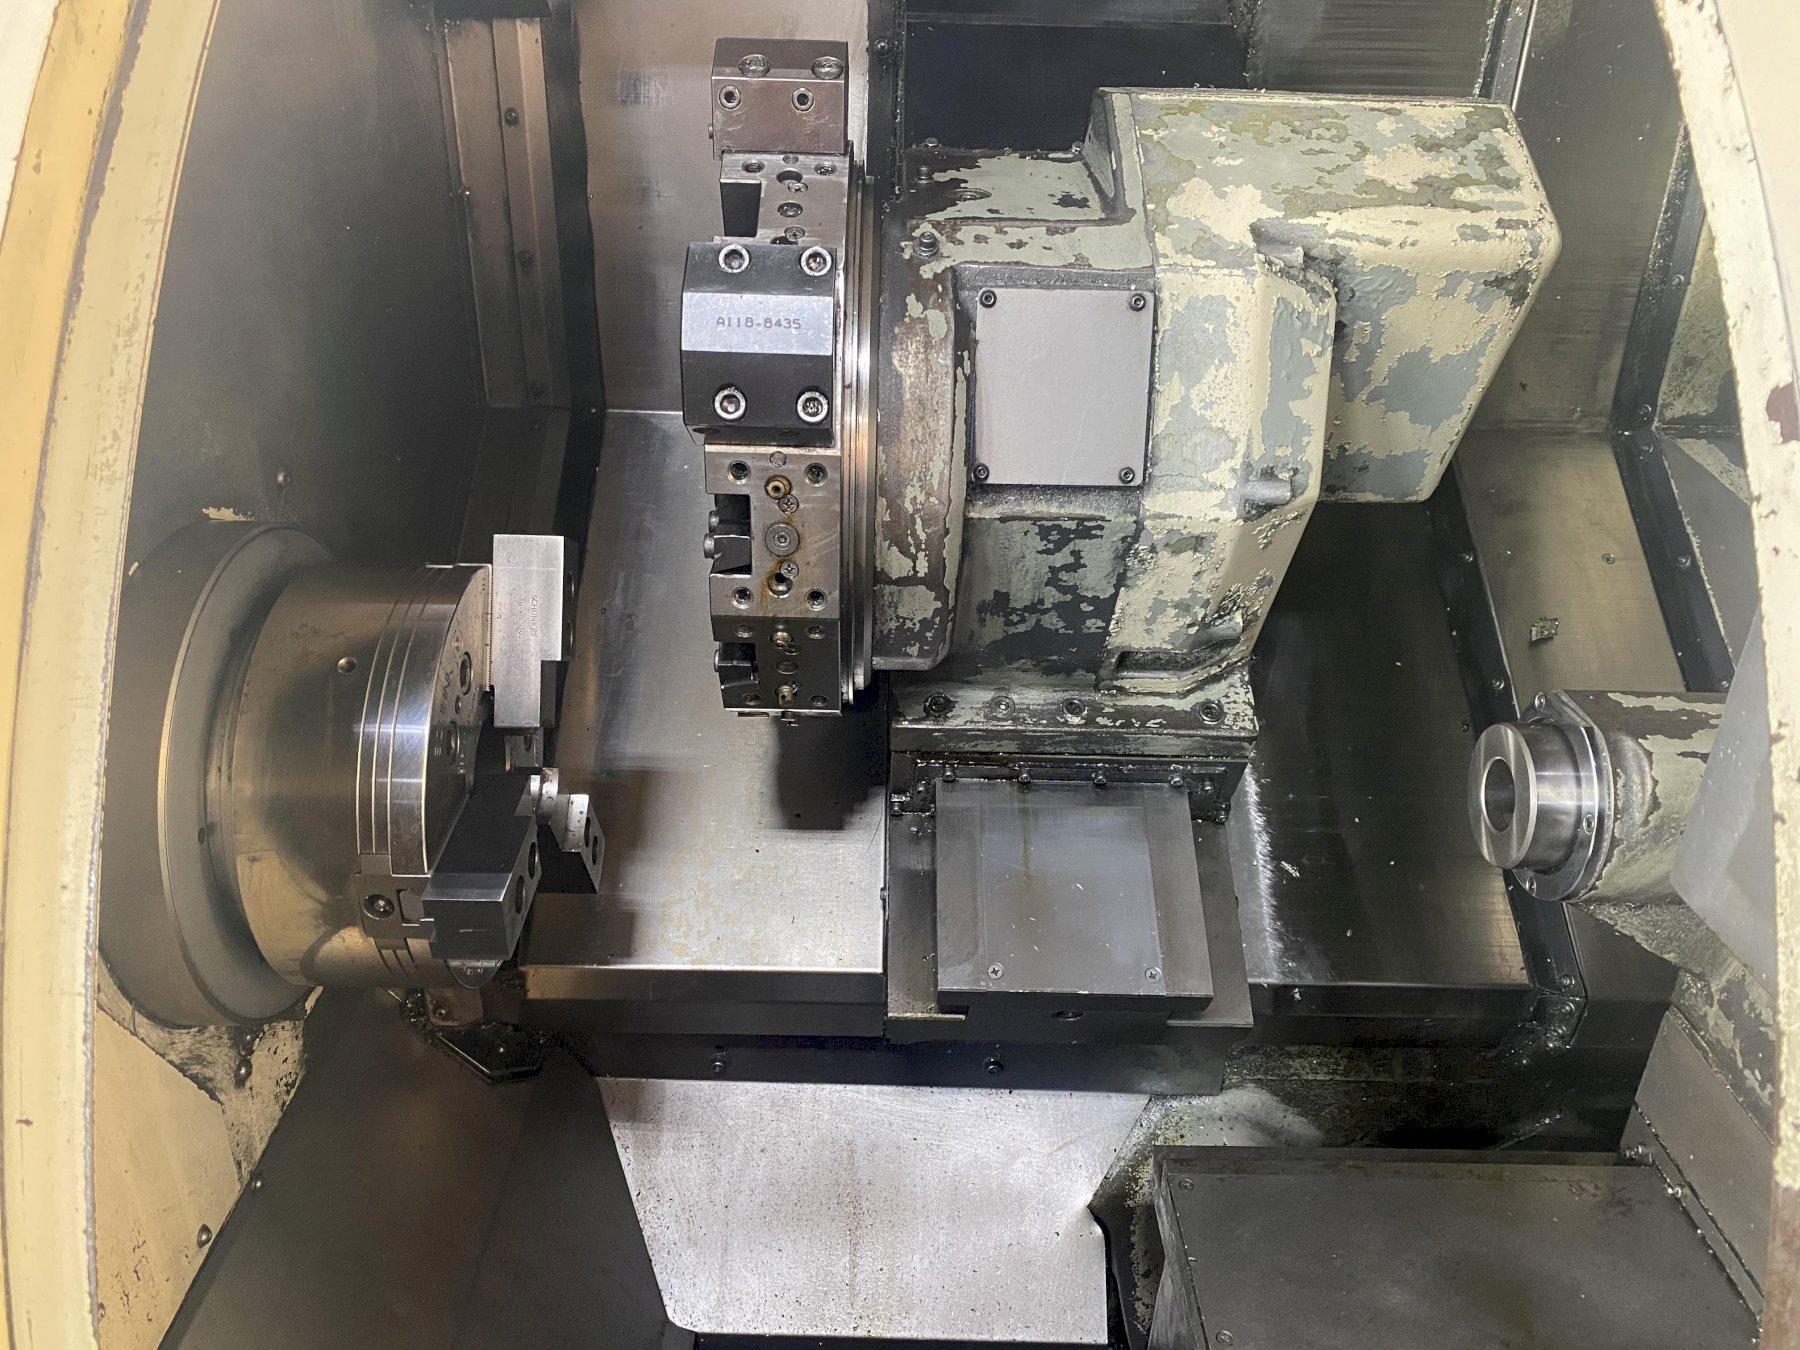 "OKUMA CROWN L1060 CNC TURNING CENTER, Okuma OSP-U10L CNC Control, 21.62"" Max Swing, 10"" 3-Jaw Chuck, 20.47"" Max Turning Length, 3"" Bar Capacity, 3500 Max RPM, 12 Station Turret, Chip Conveyor, New 2000."